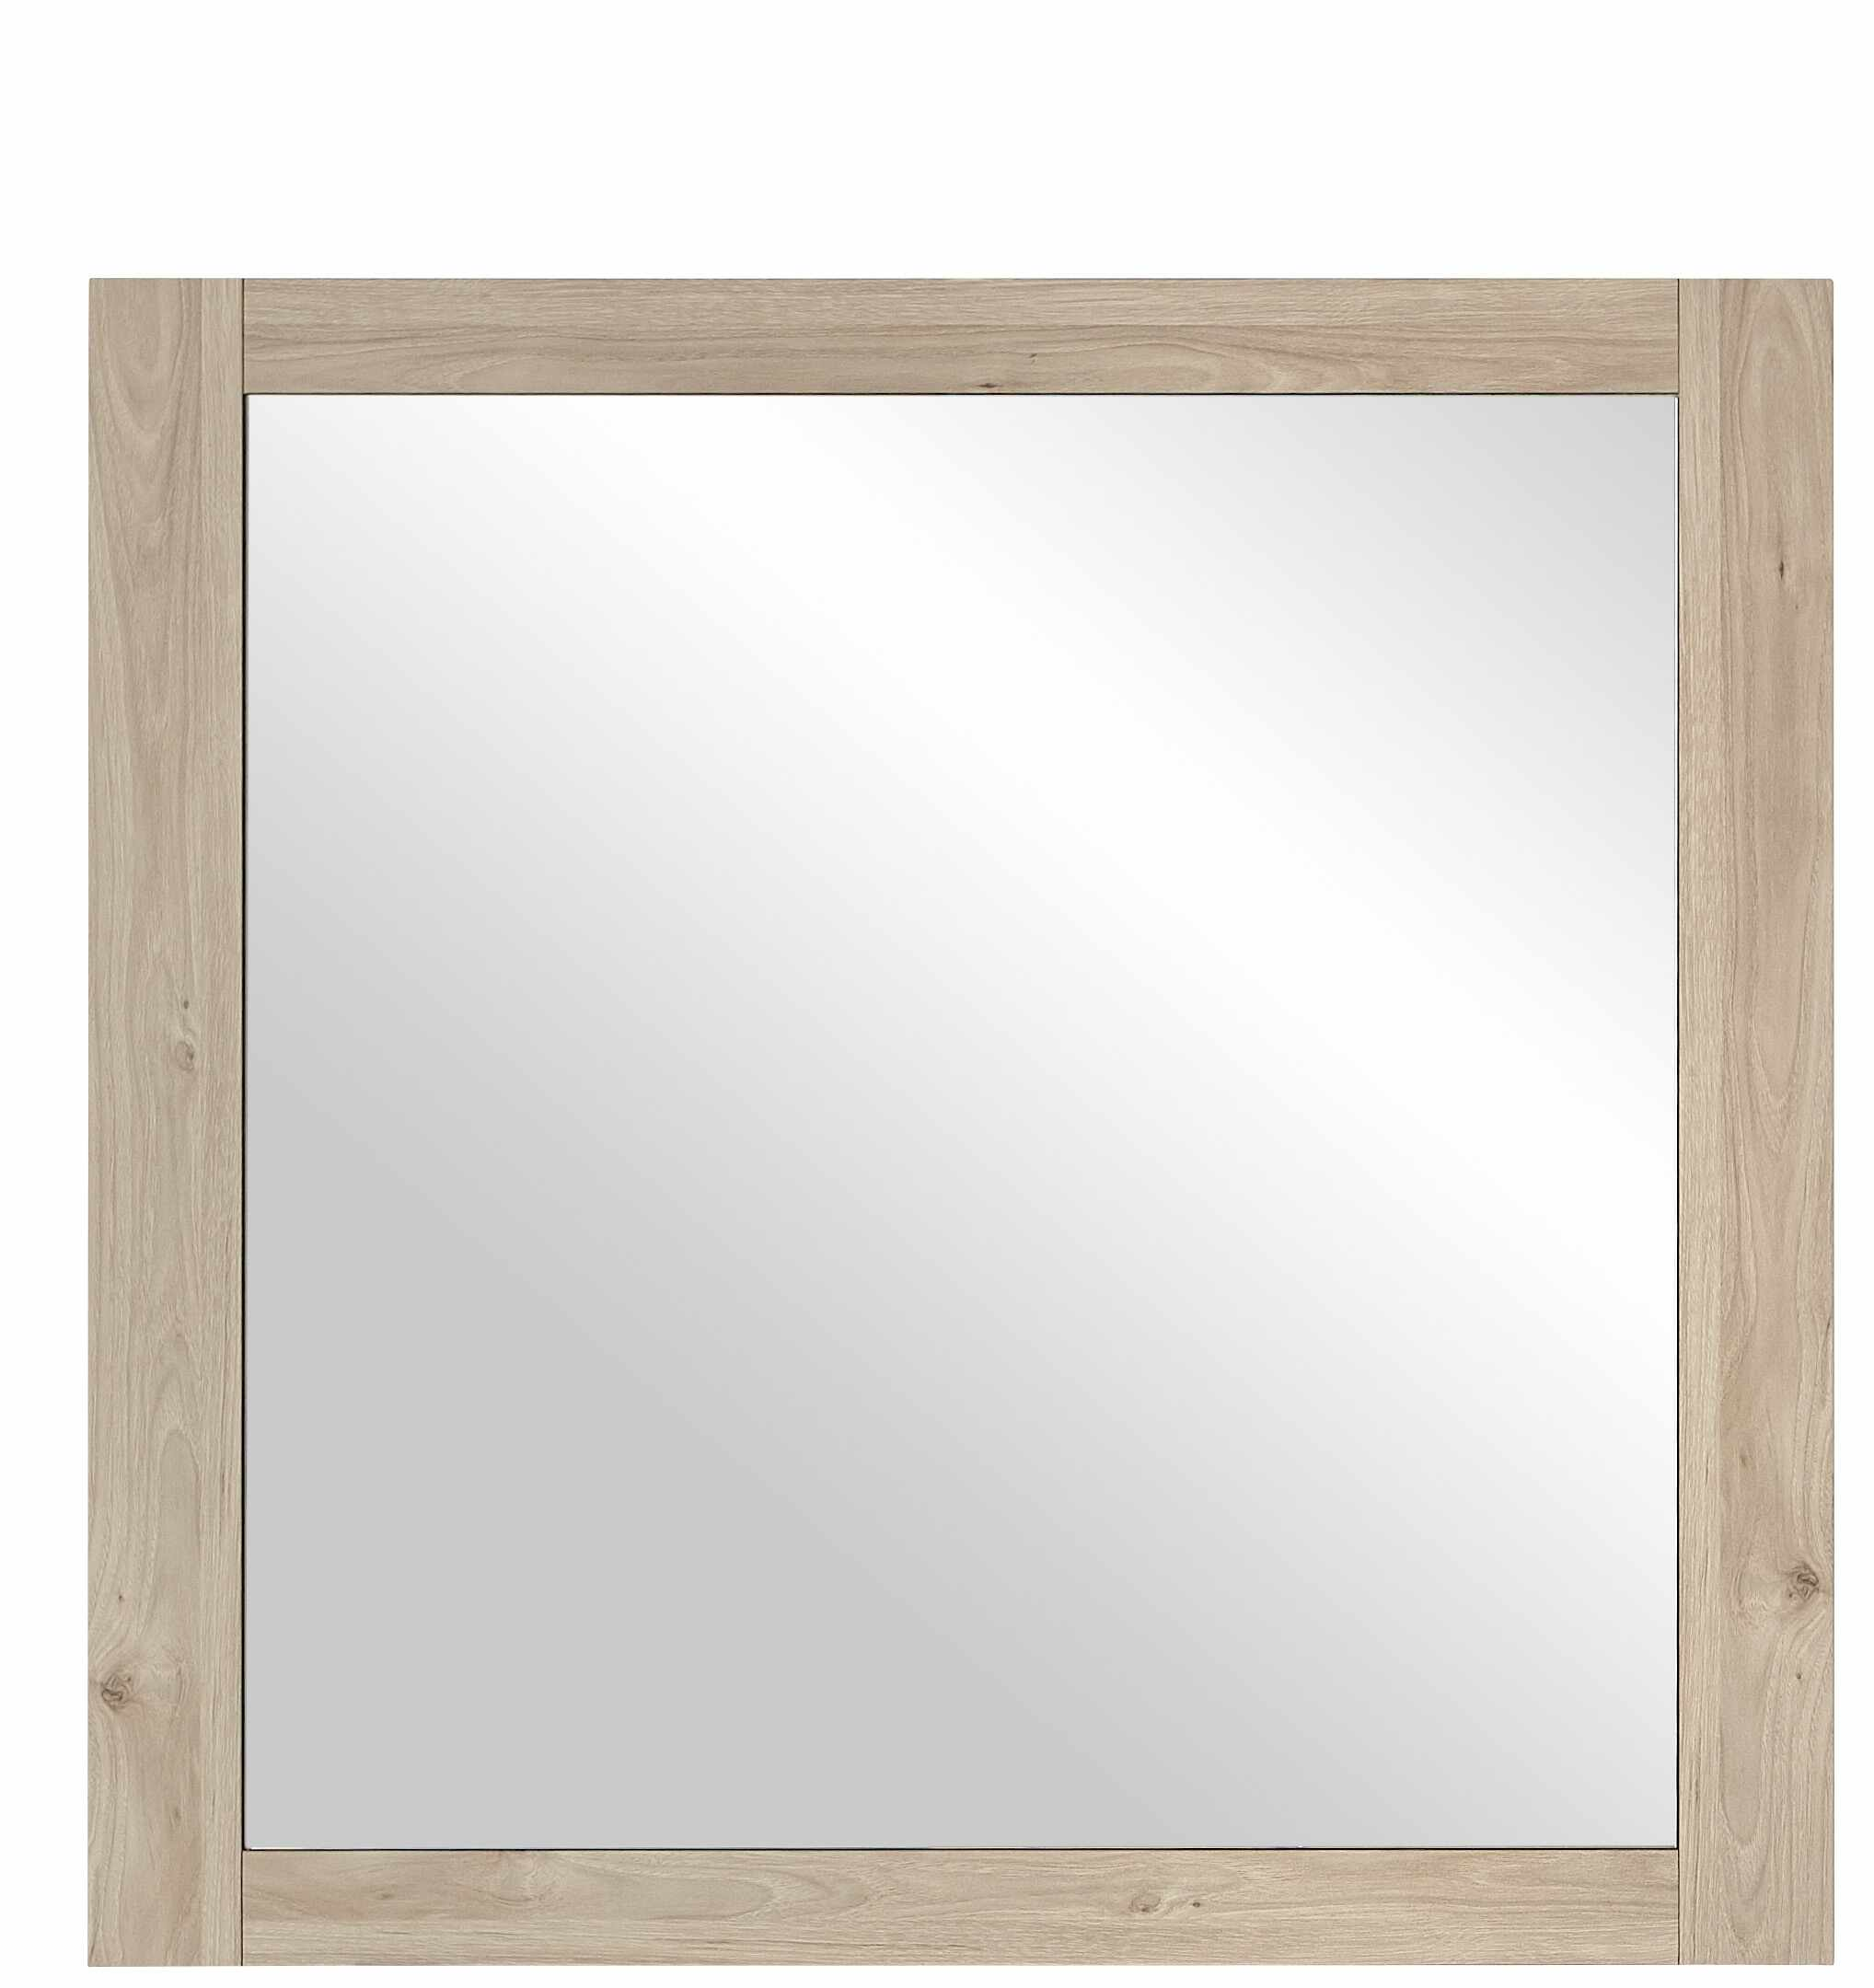 Oglinda din pal, Fines Natural, l90xH87 cm la pret 411 lei